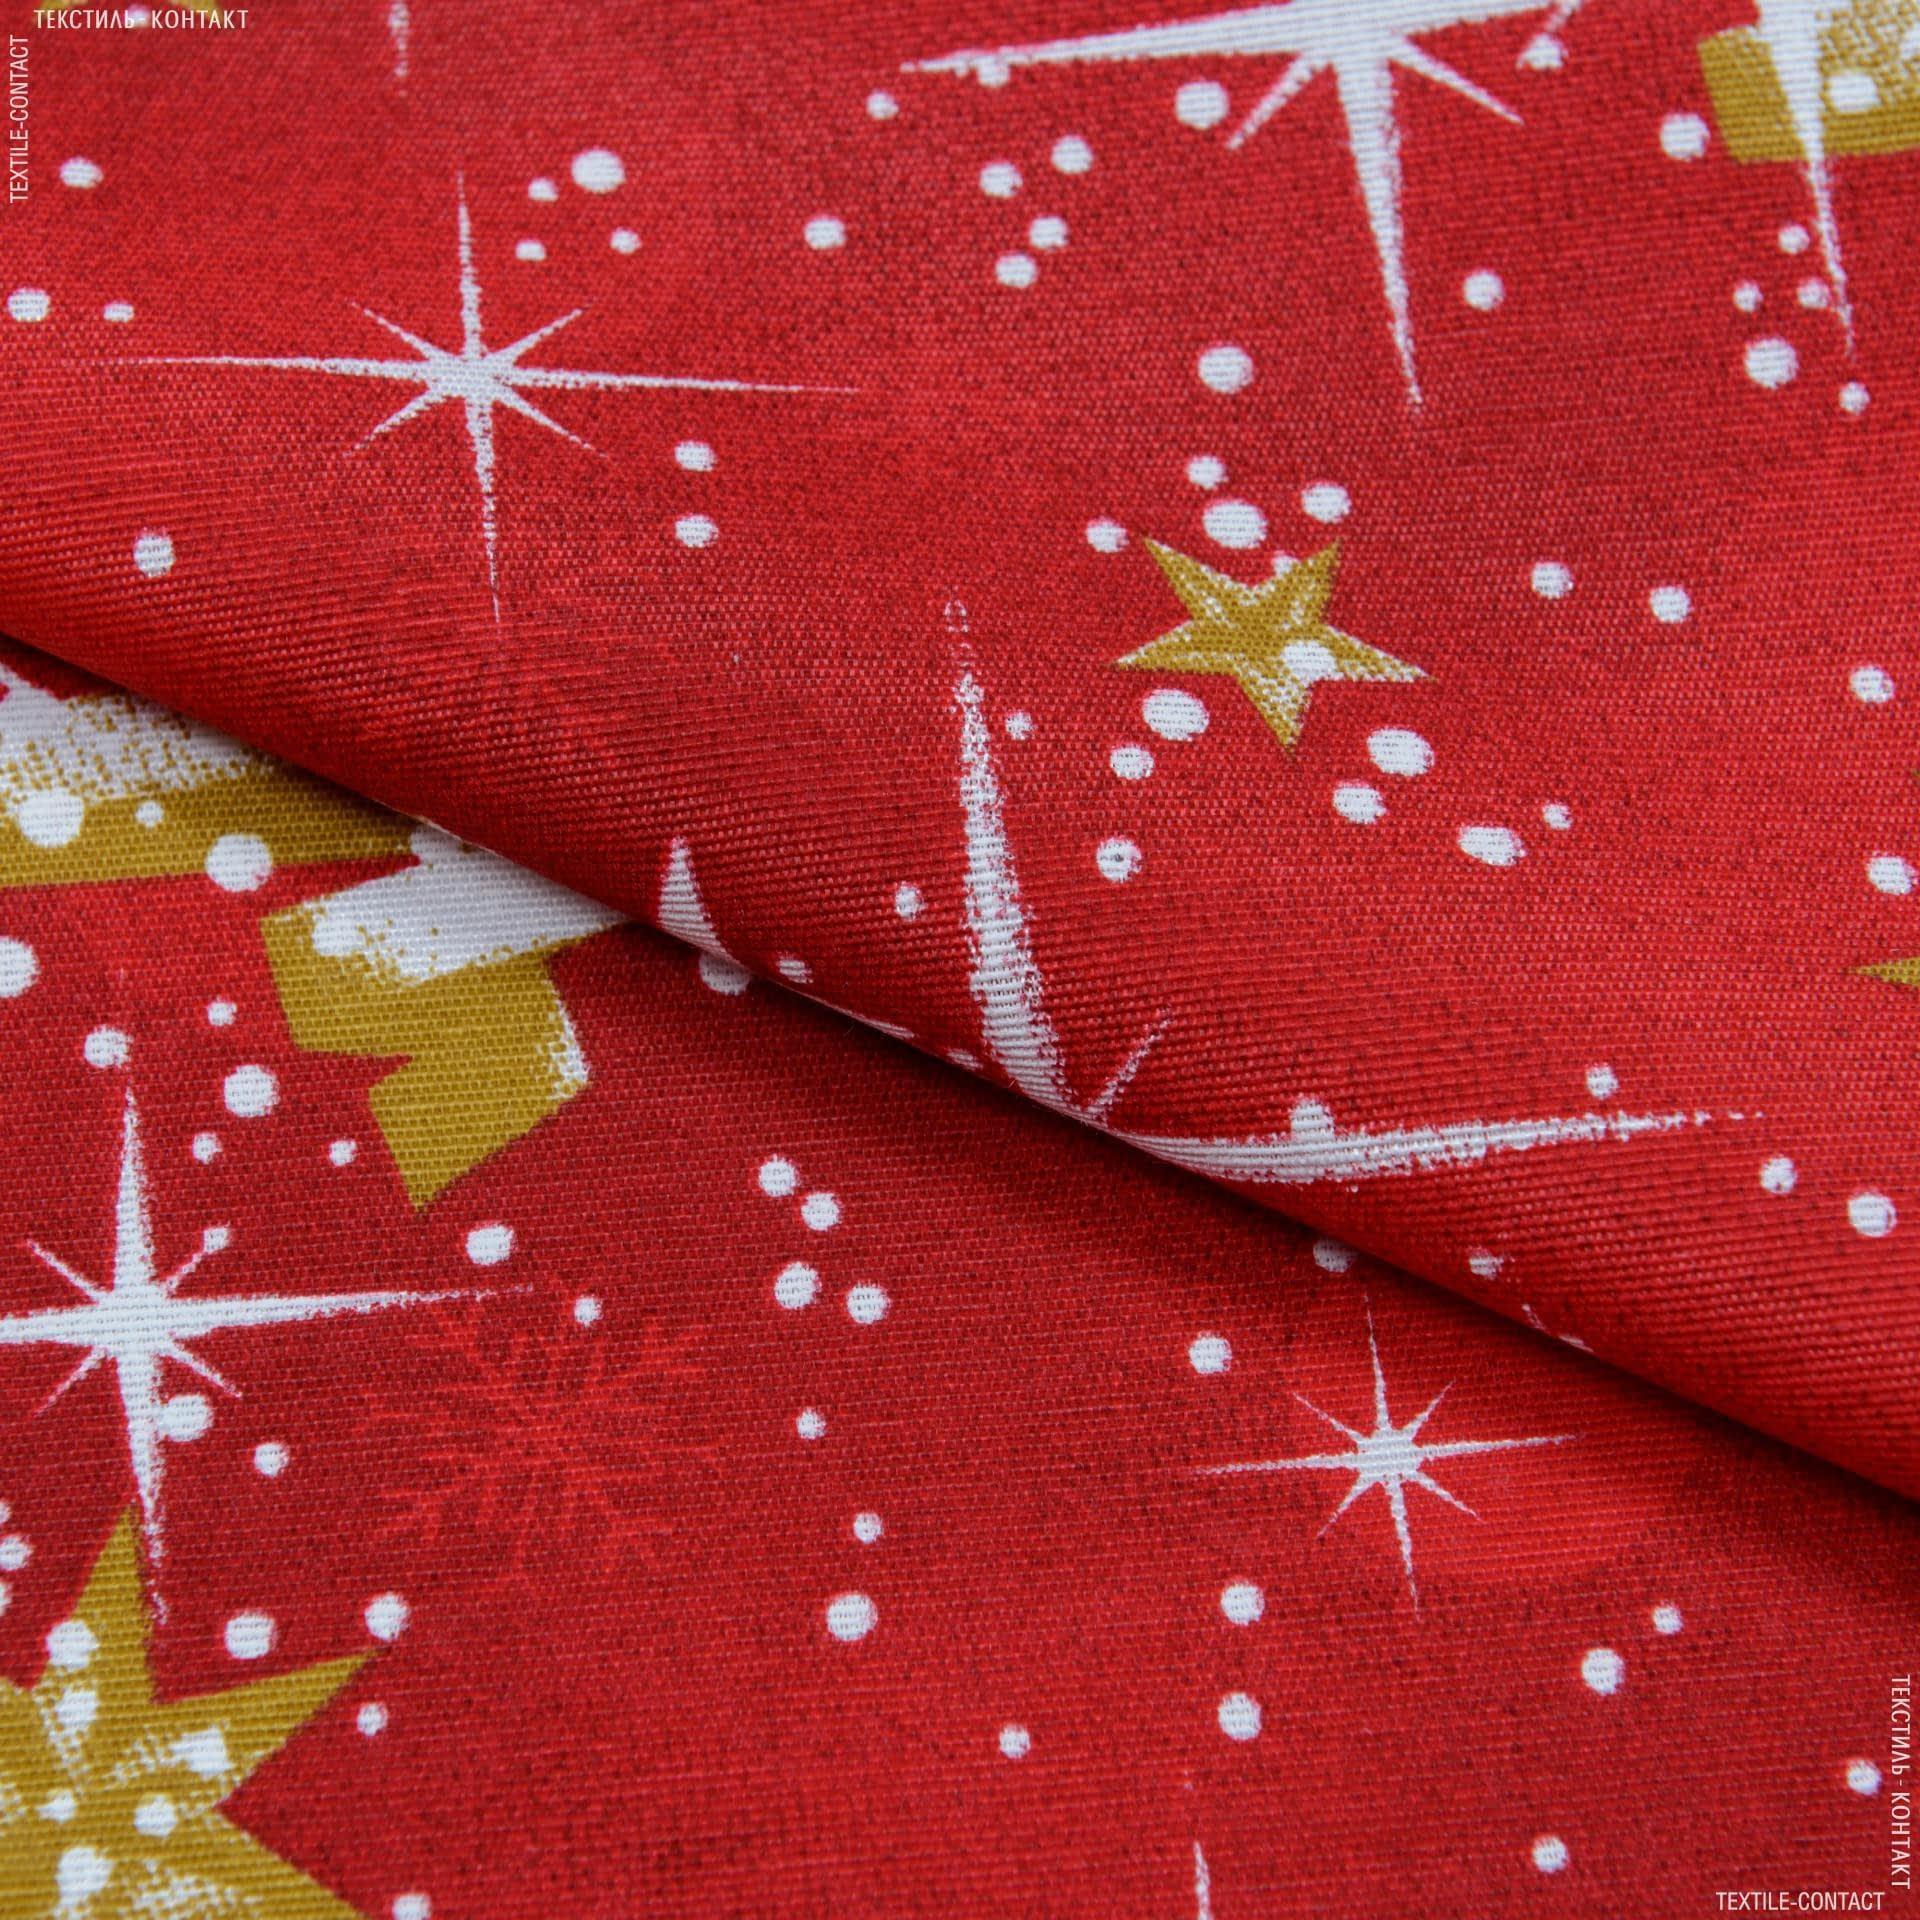 Ткани для декоративных подушек - Декоративная новогодняя ткань Лонета  / Елочка звезды, золото